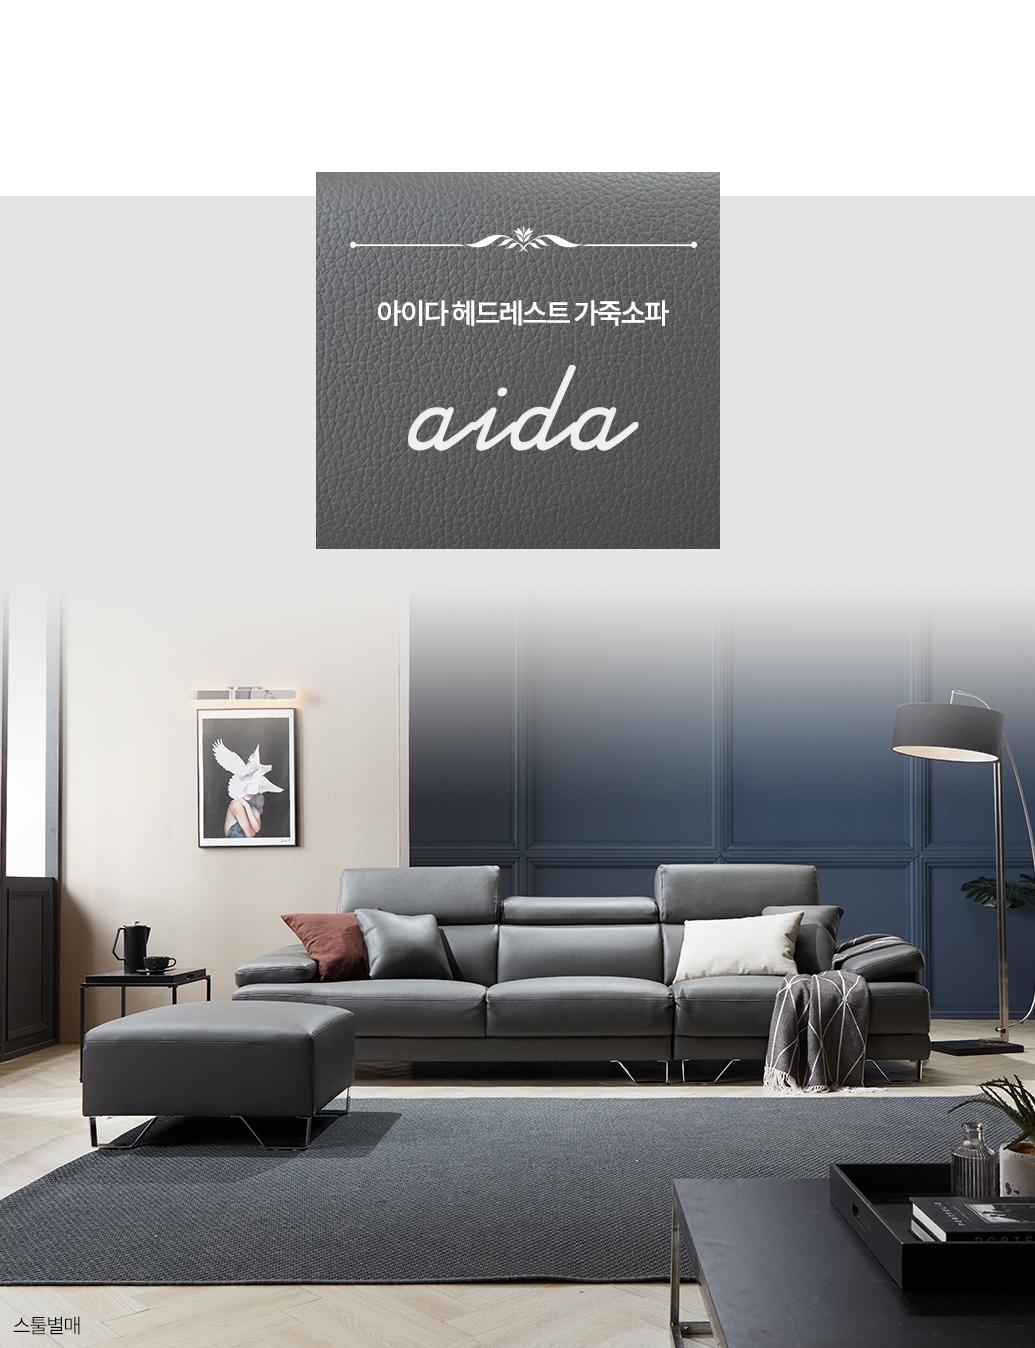 aida_01.jpg